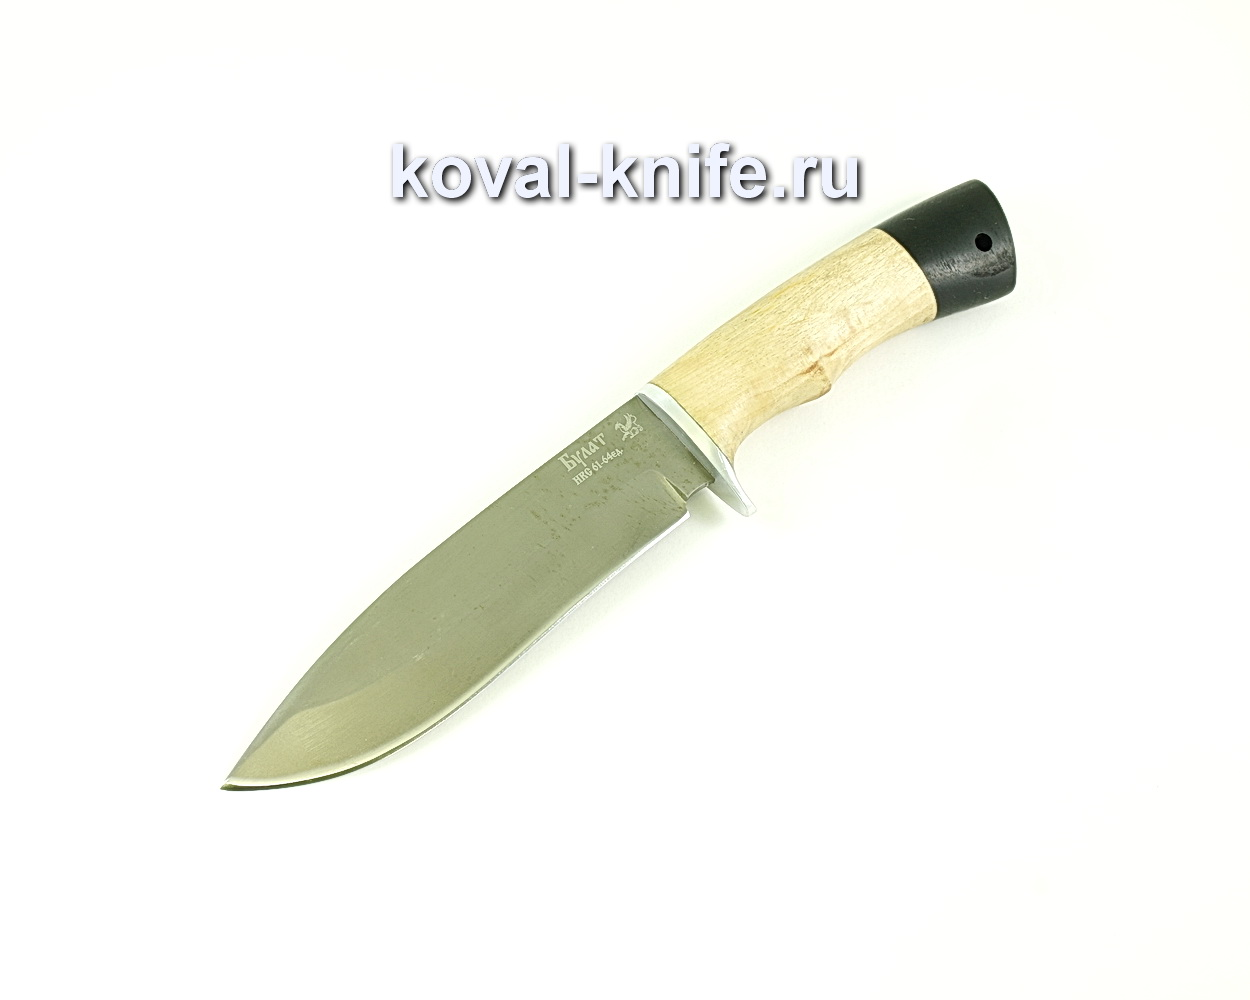 Нож Орлан (сталь Булат), рукоять орех, граб A093